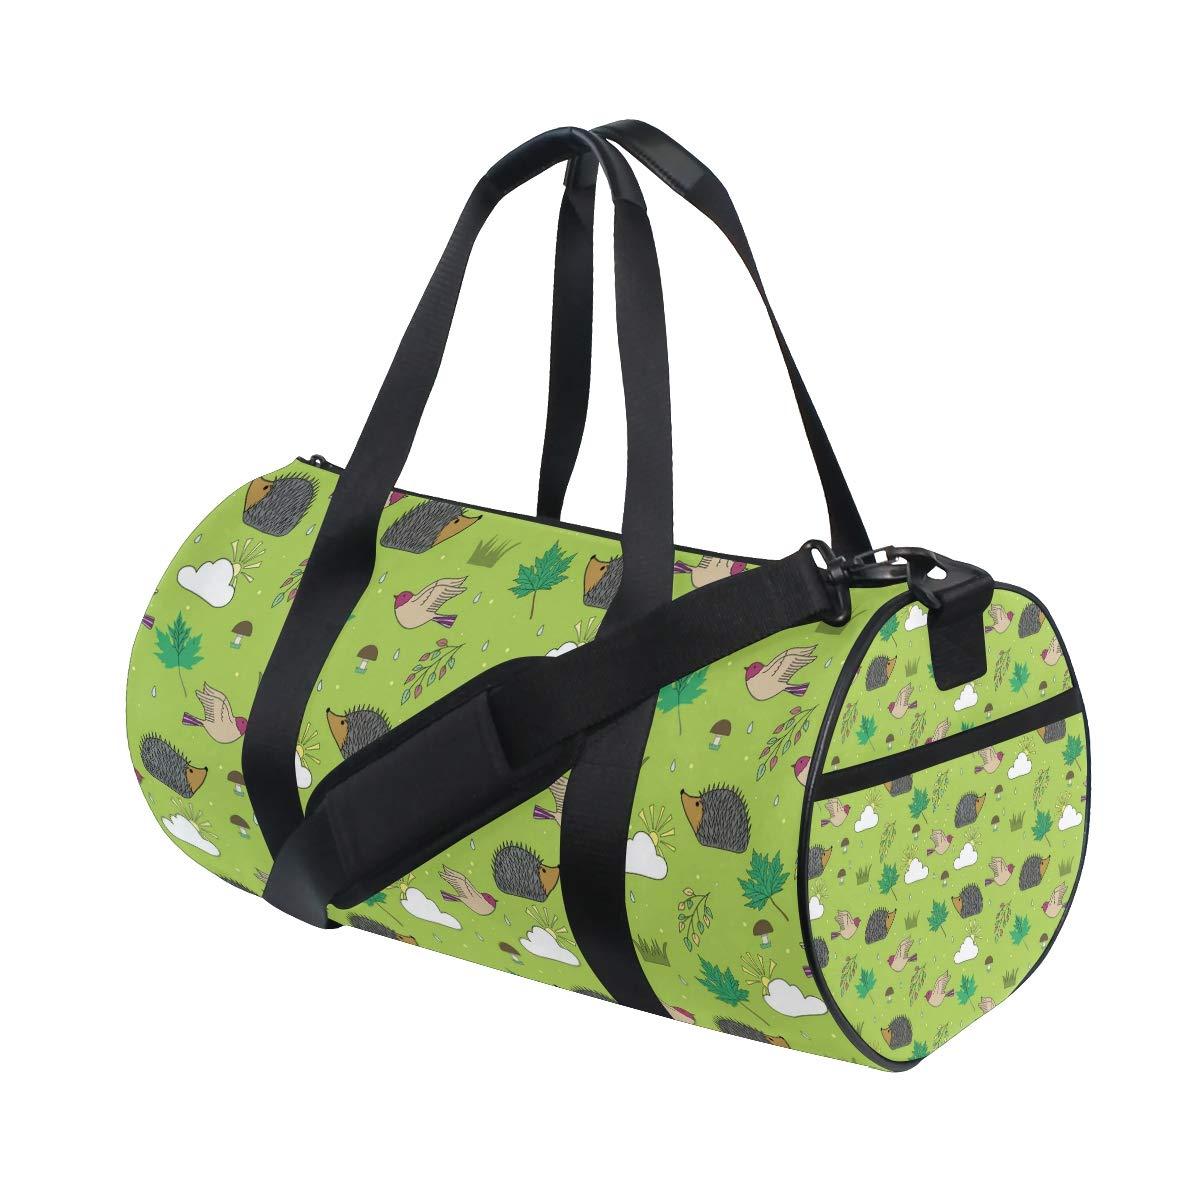 Unisex's Hedgehog Duffel Bag Travel Tote Luggage Bag Gym Sports Gear Drum Set Equipment Travel Luggage Bag